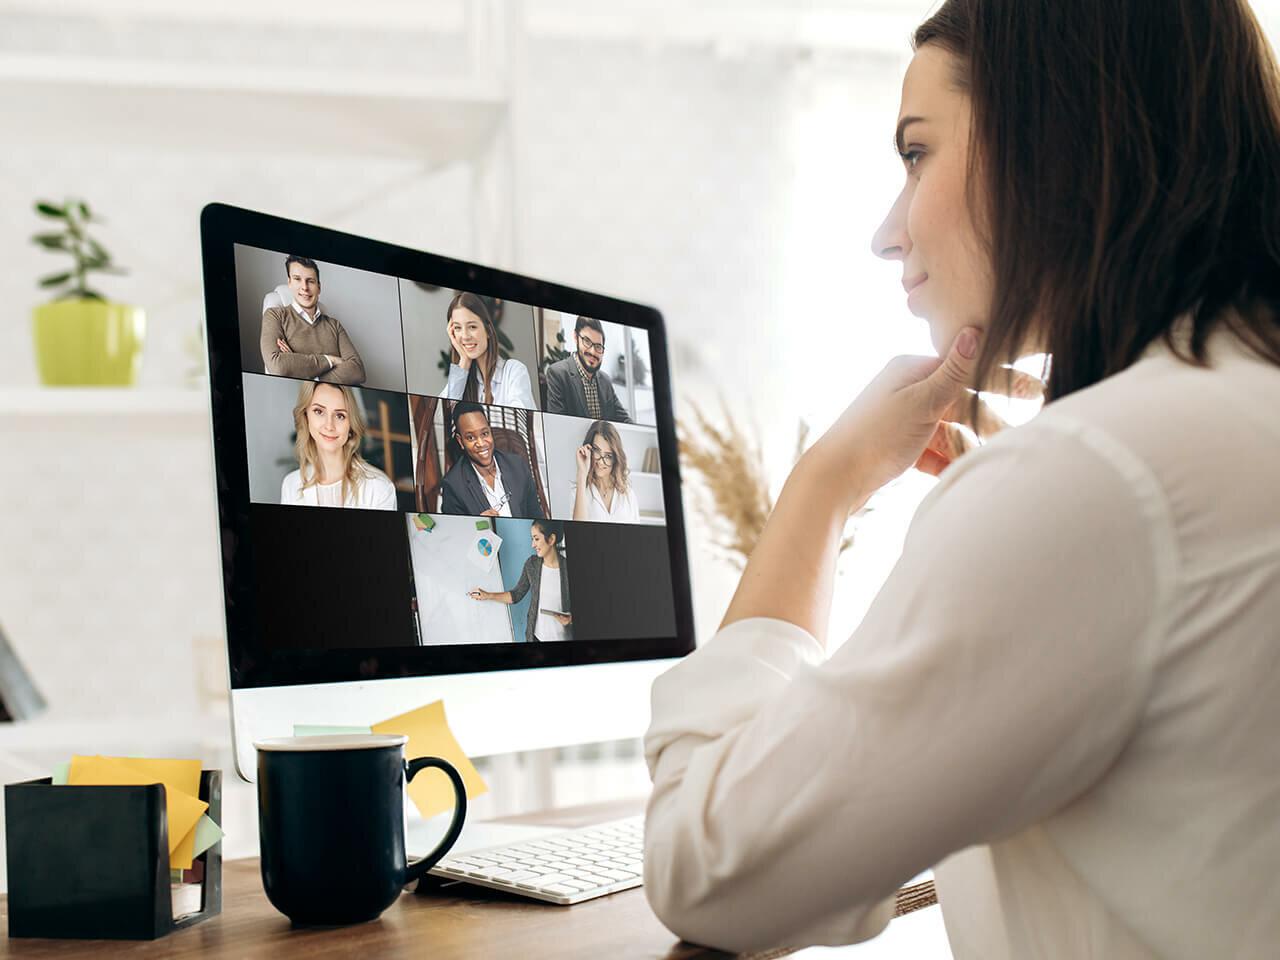 Webinar: Strategies for Working Remotely